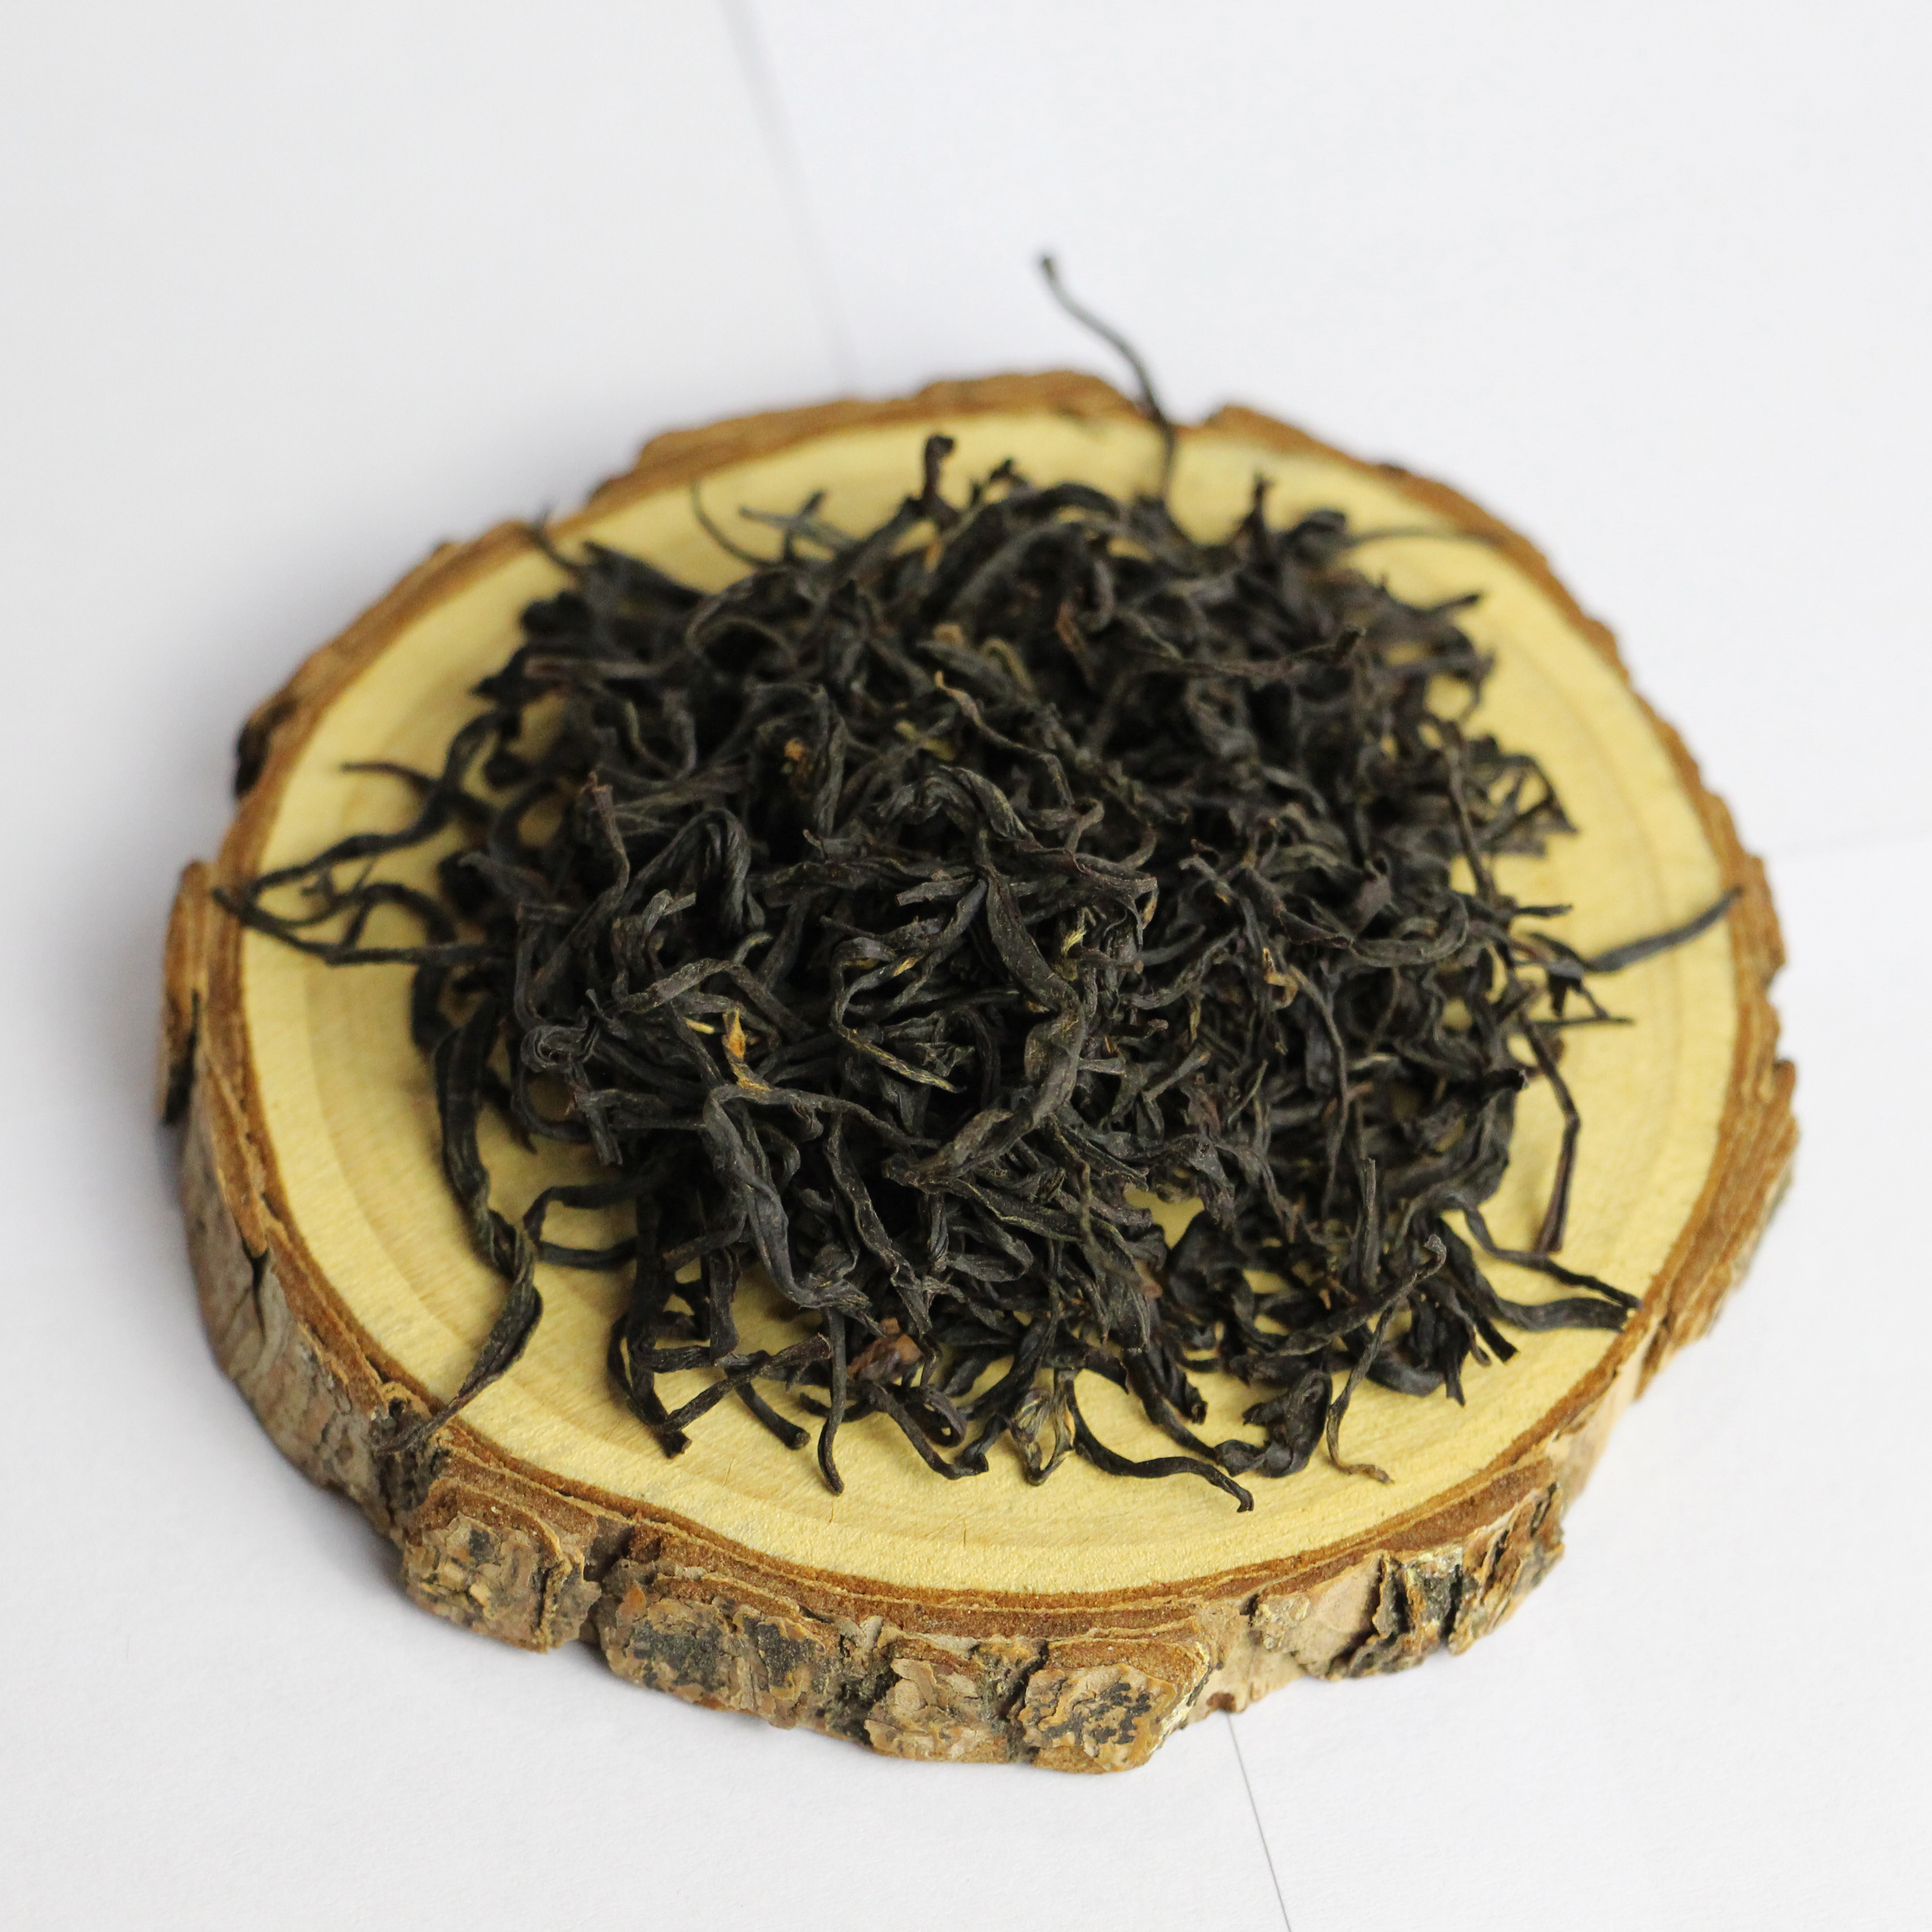 sun moon lake black tea 100% natural fresh tea bulk black tea - 4uTea   4uTea.com